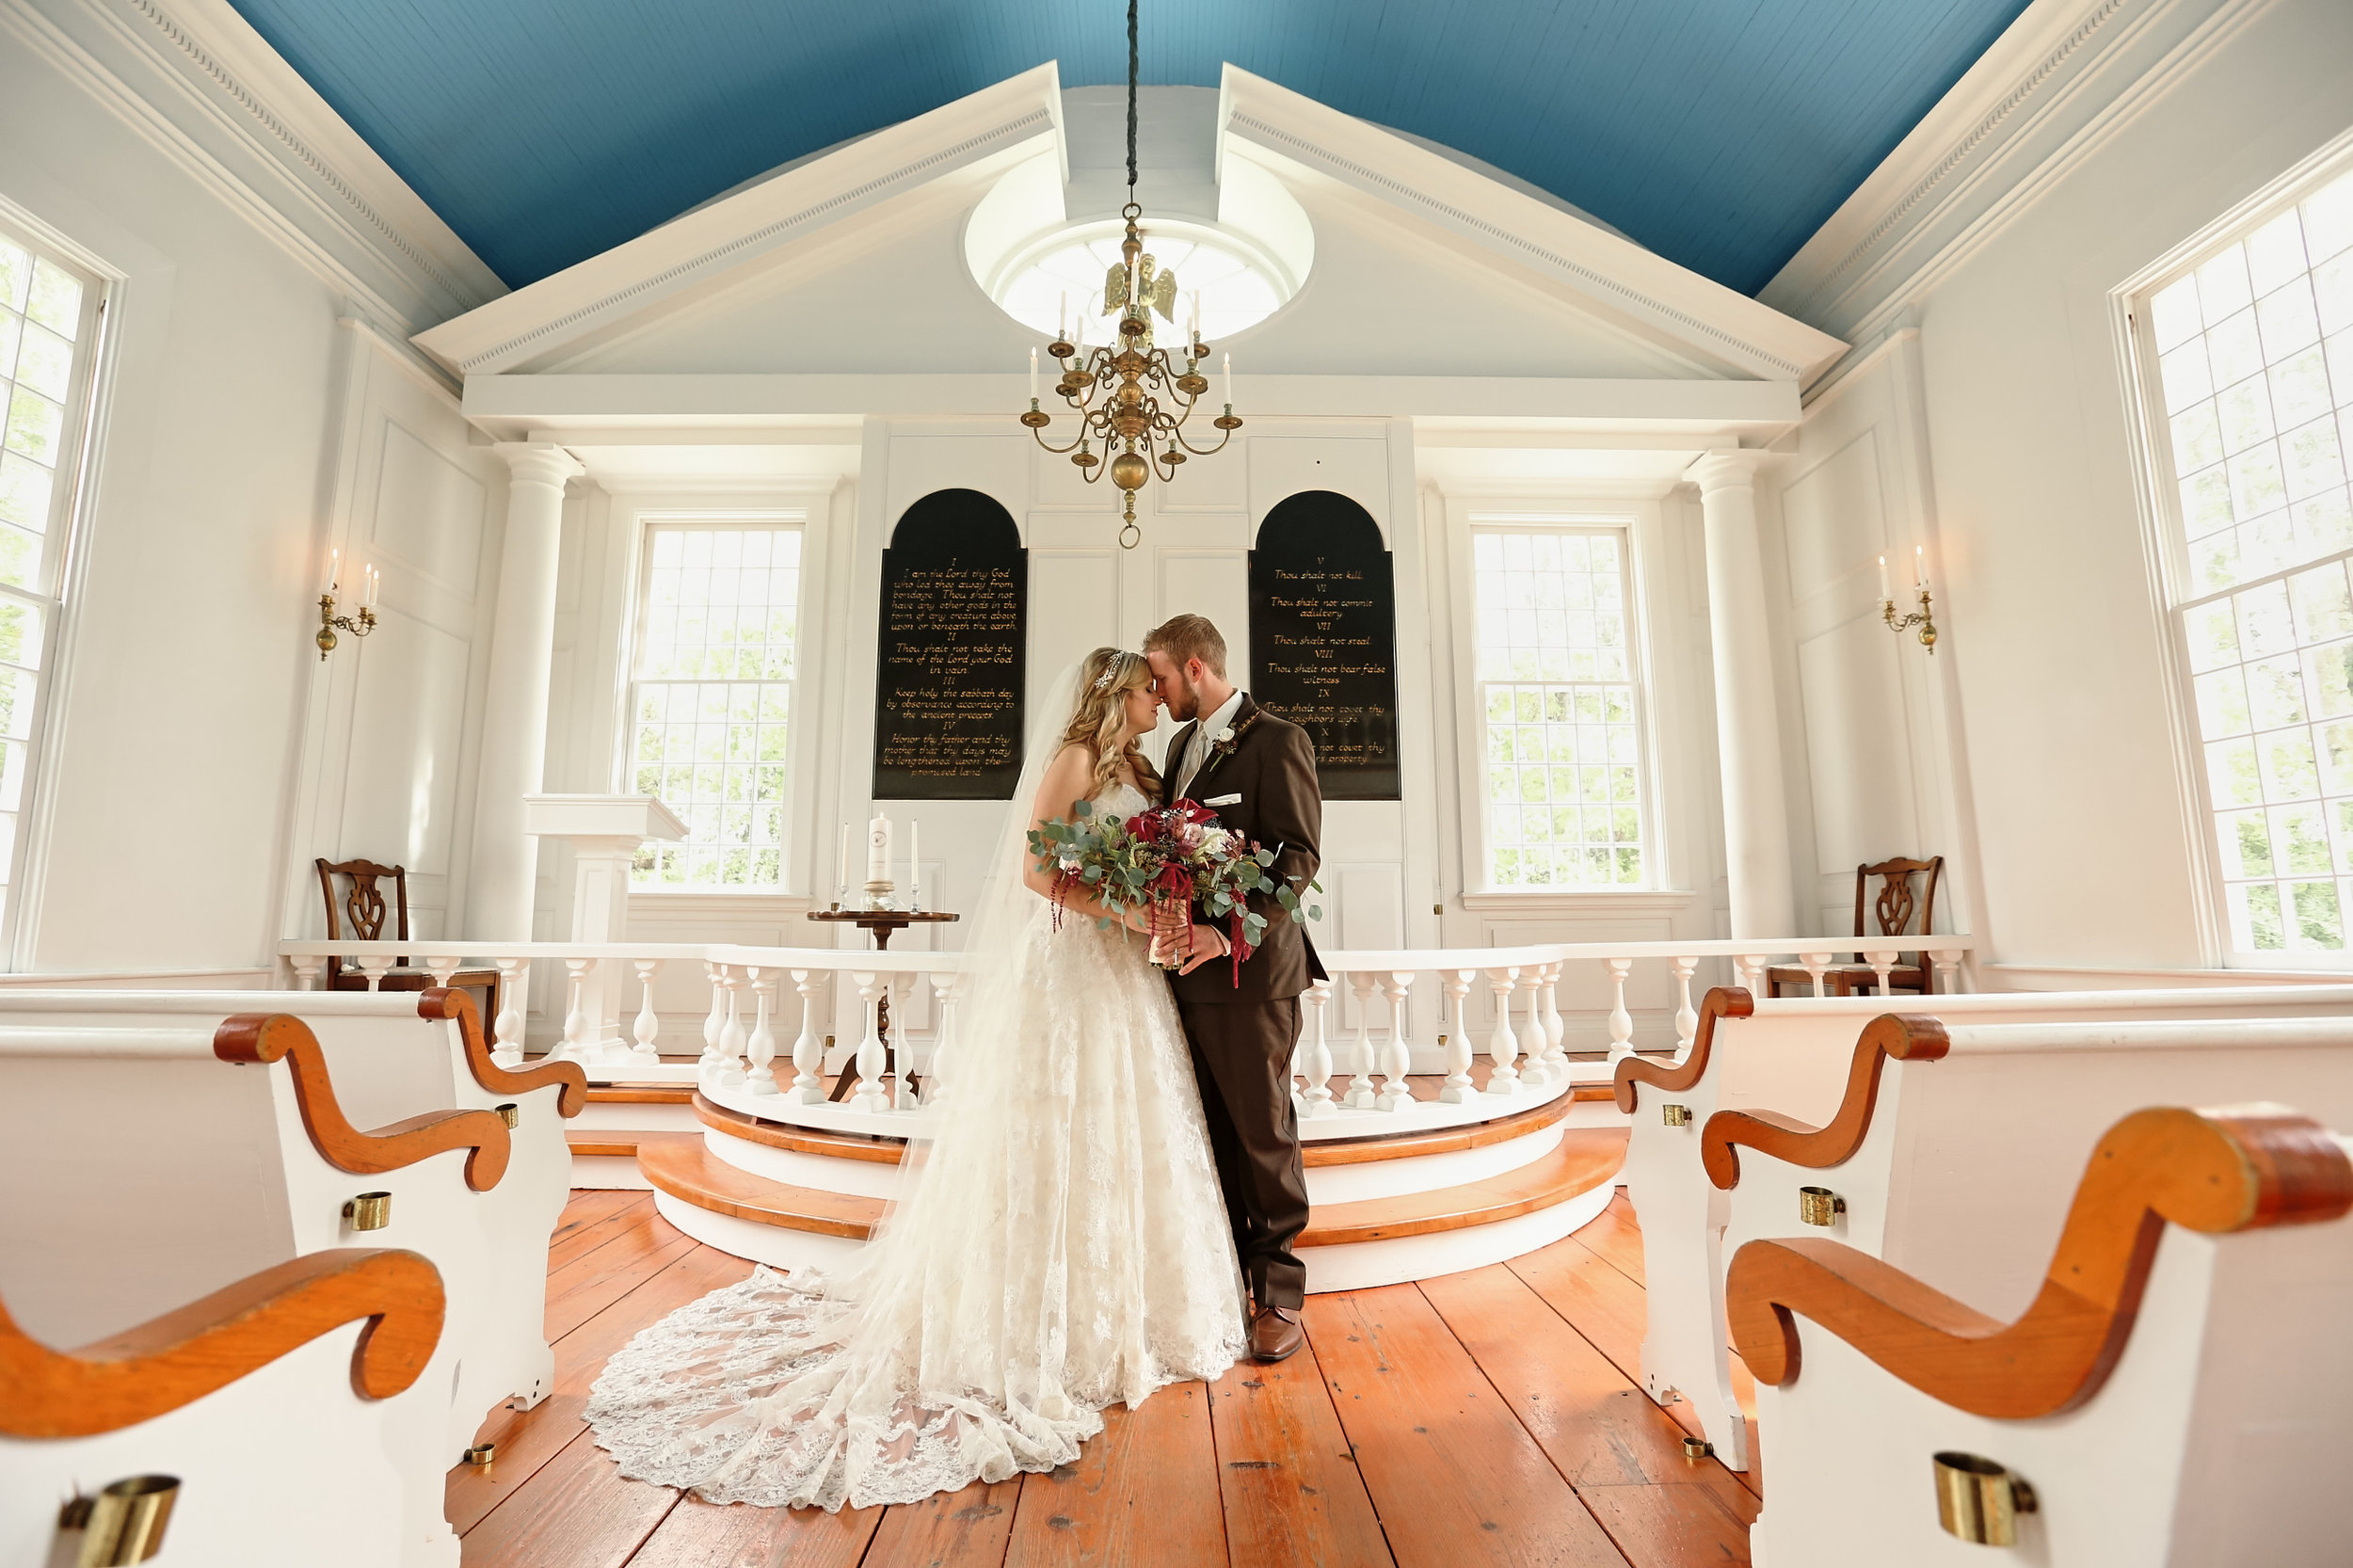 Oct 16 2016 Wedding Daniel Boone Home Peace Chapel Cedar Lake Cellars Winery St Charles Defiance Fall Nichole Oldani